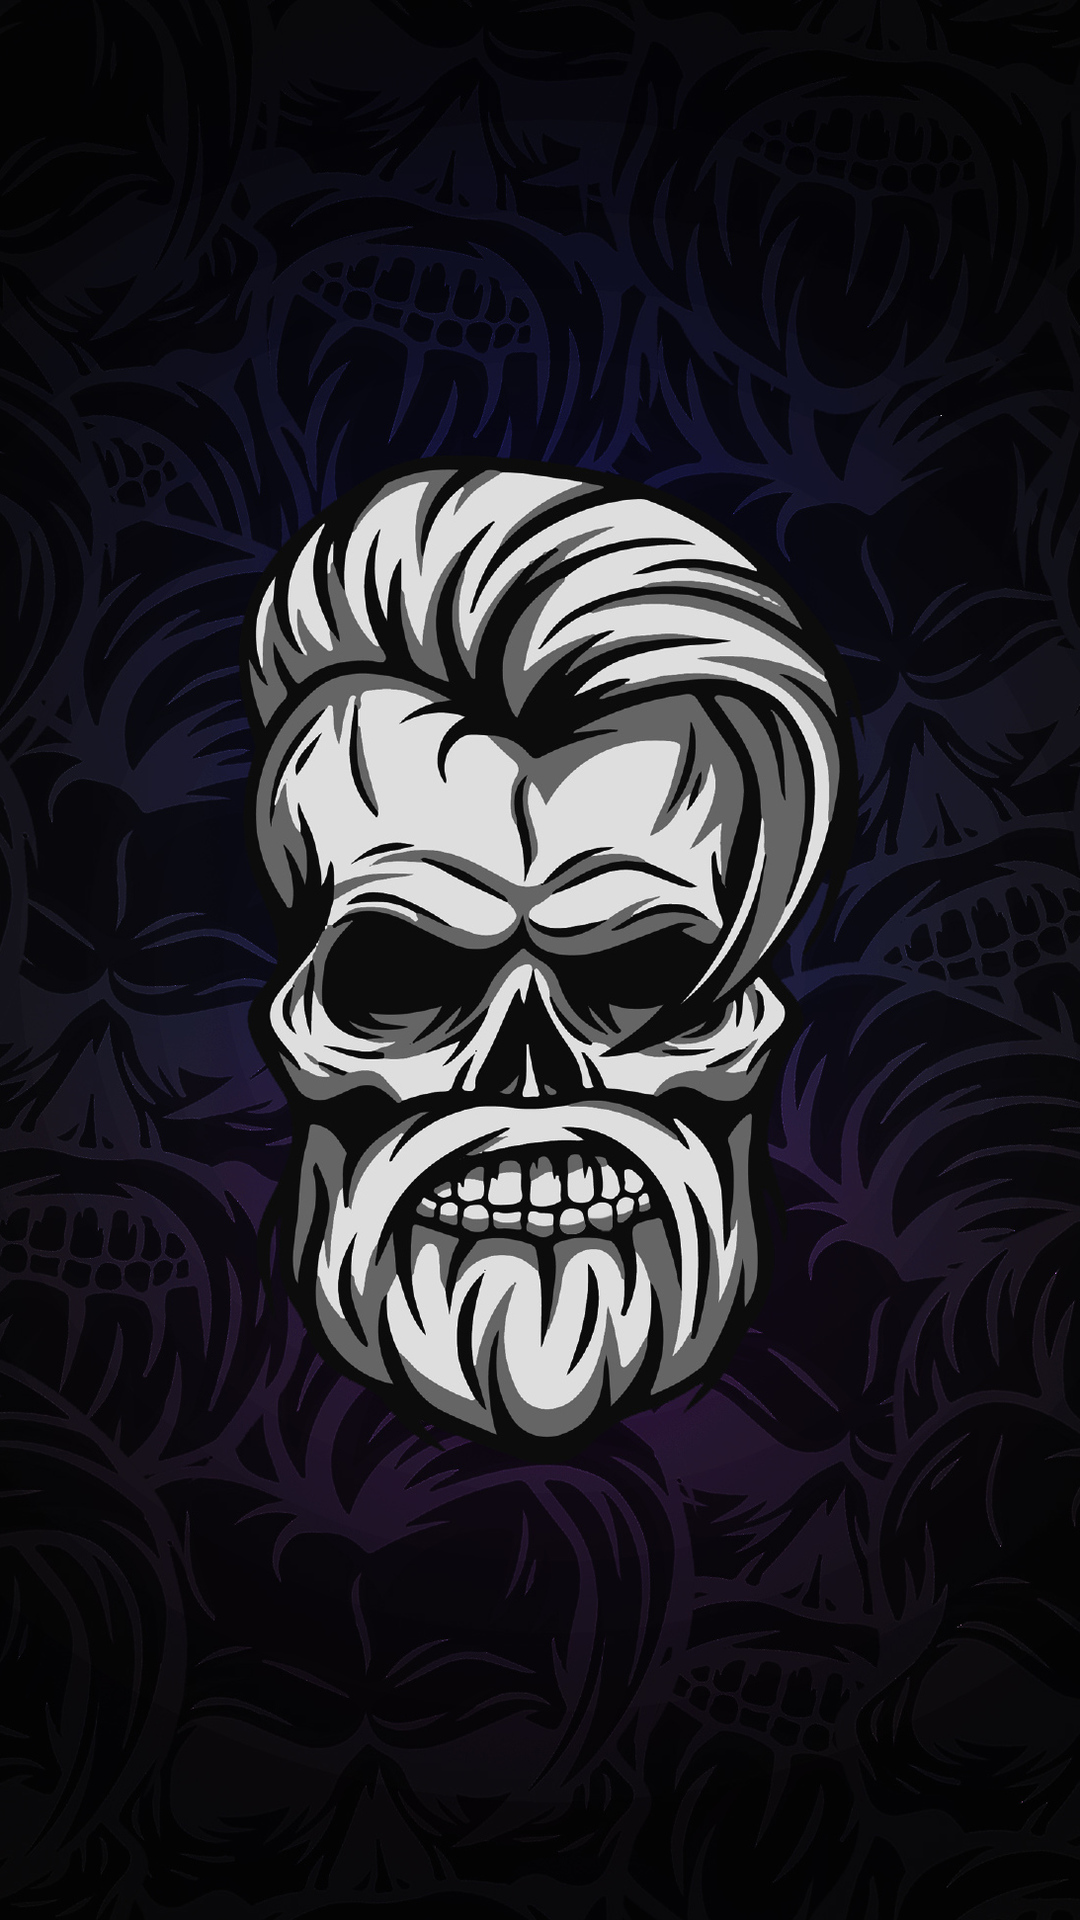 beard skull dark 4k j7 1080x1920 - Pack de Fondos de Pantalla Minimalistas (+100 Imagenes)